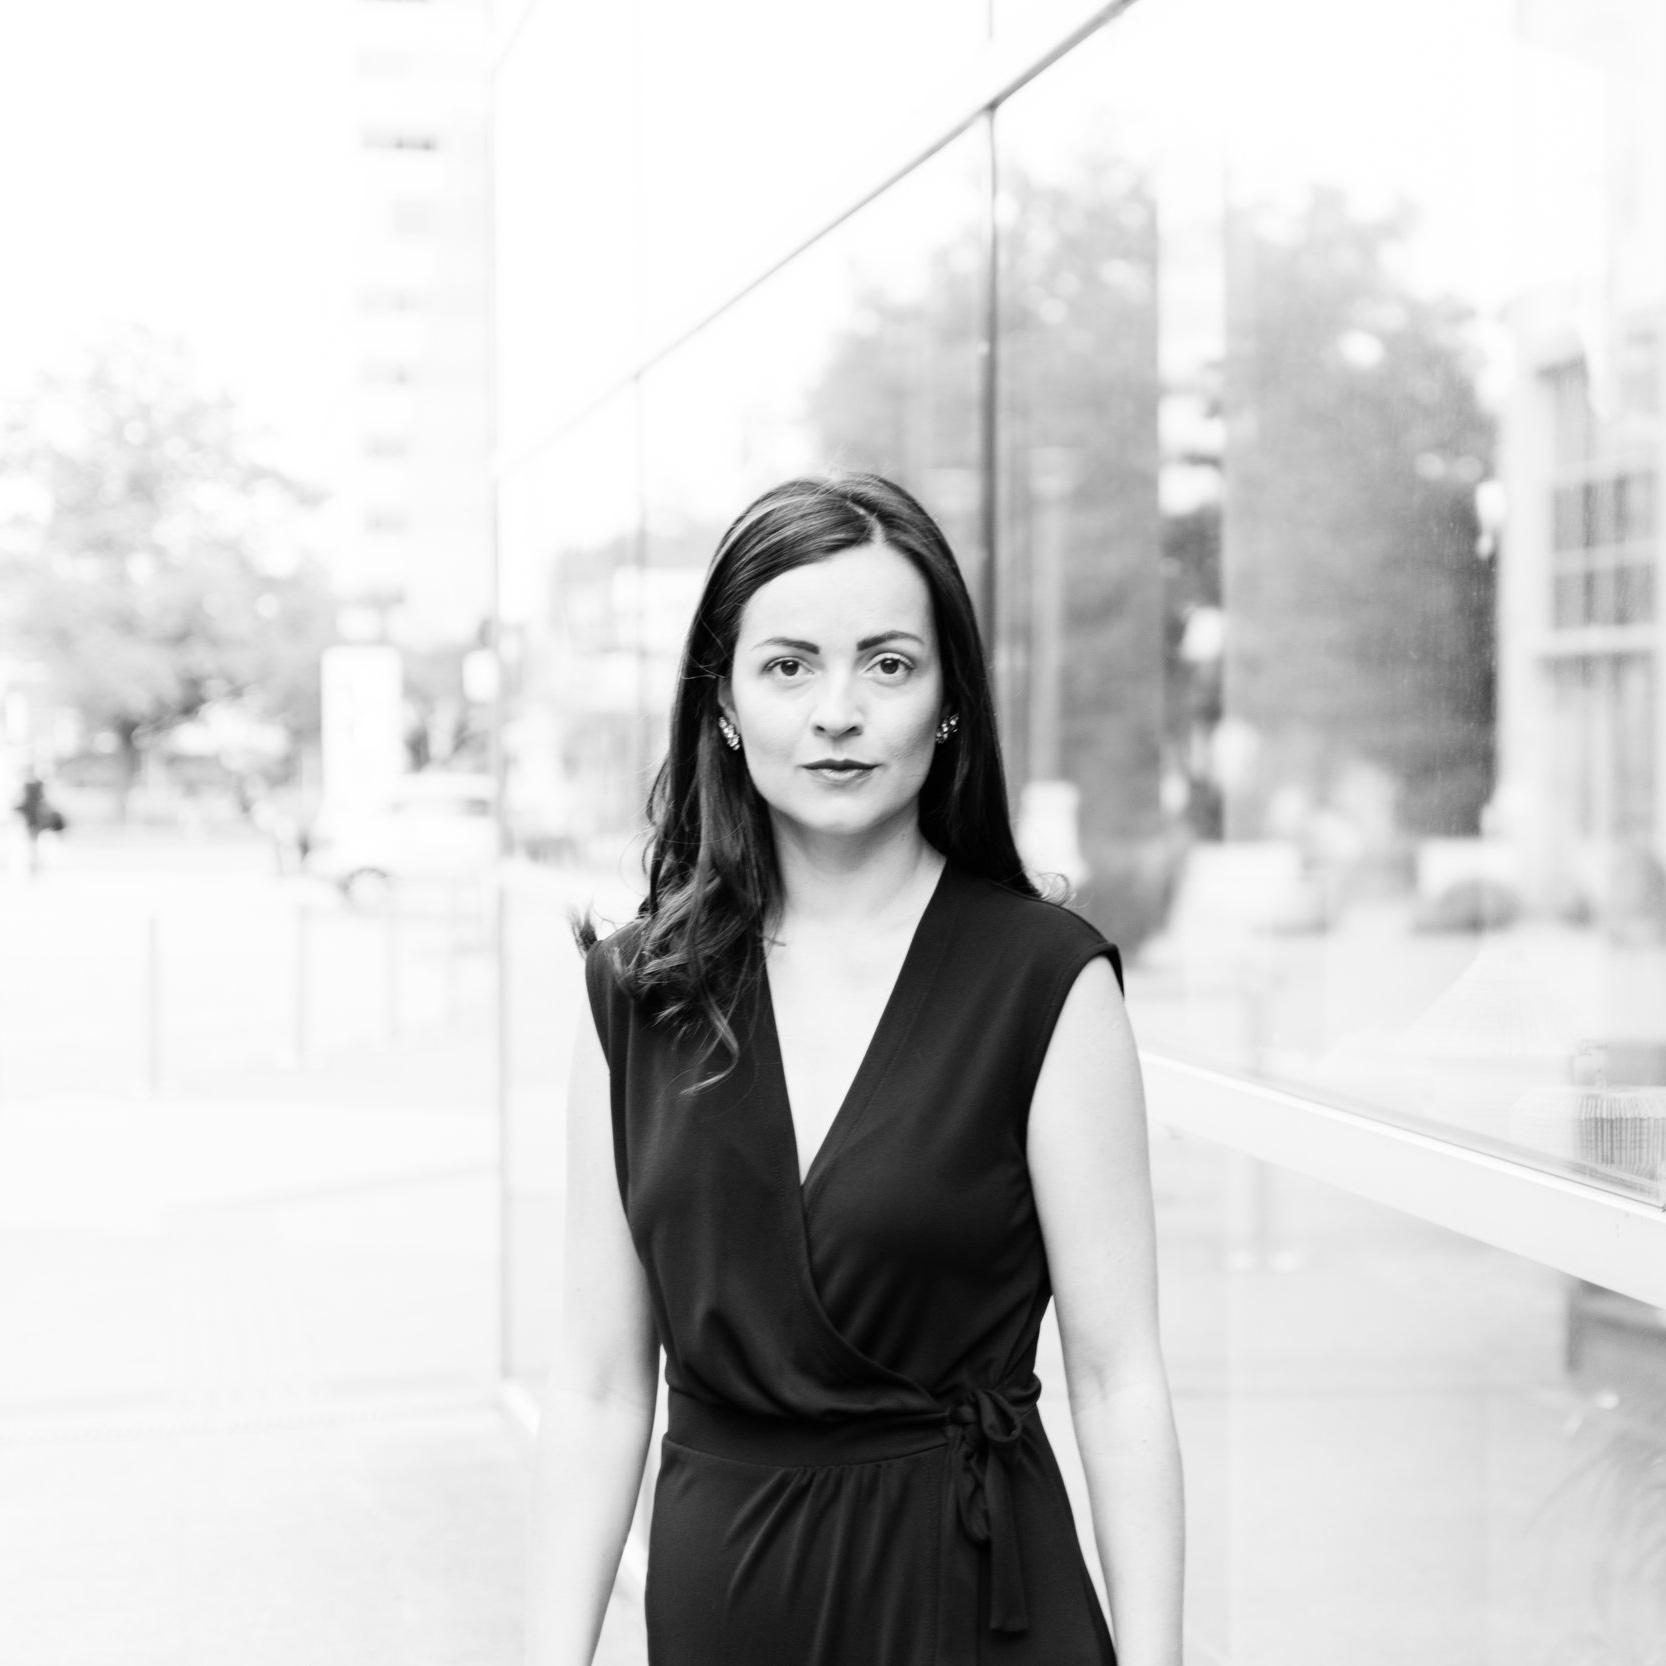 the artists mindset The Artist's Mindset artist mindset Elisabeth Breuer Mentale Stärke für Musiker Training Podcast